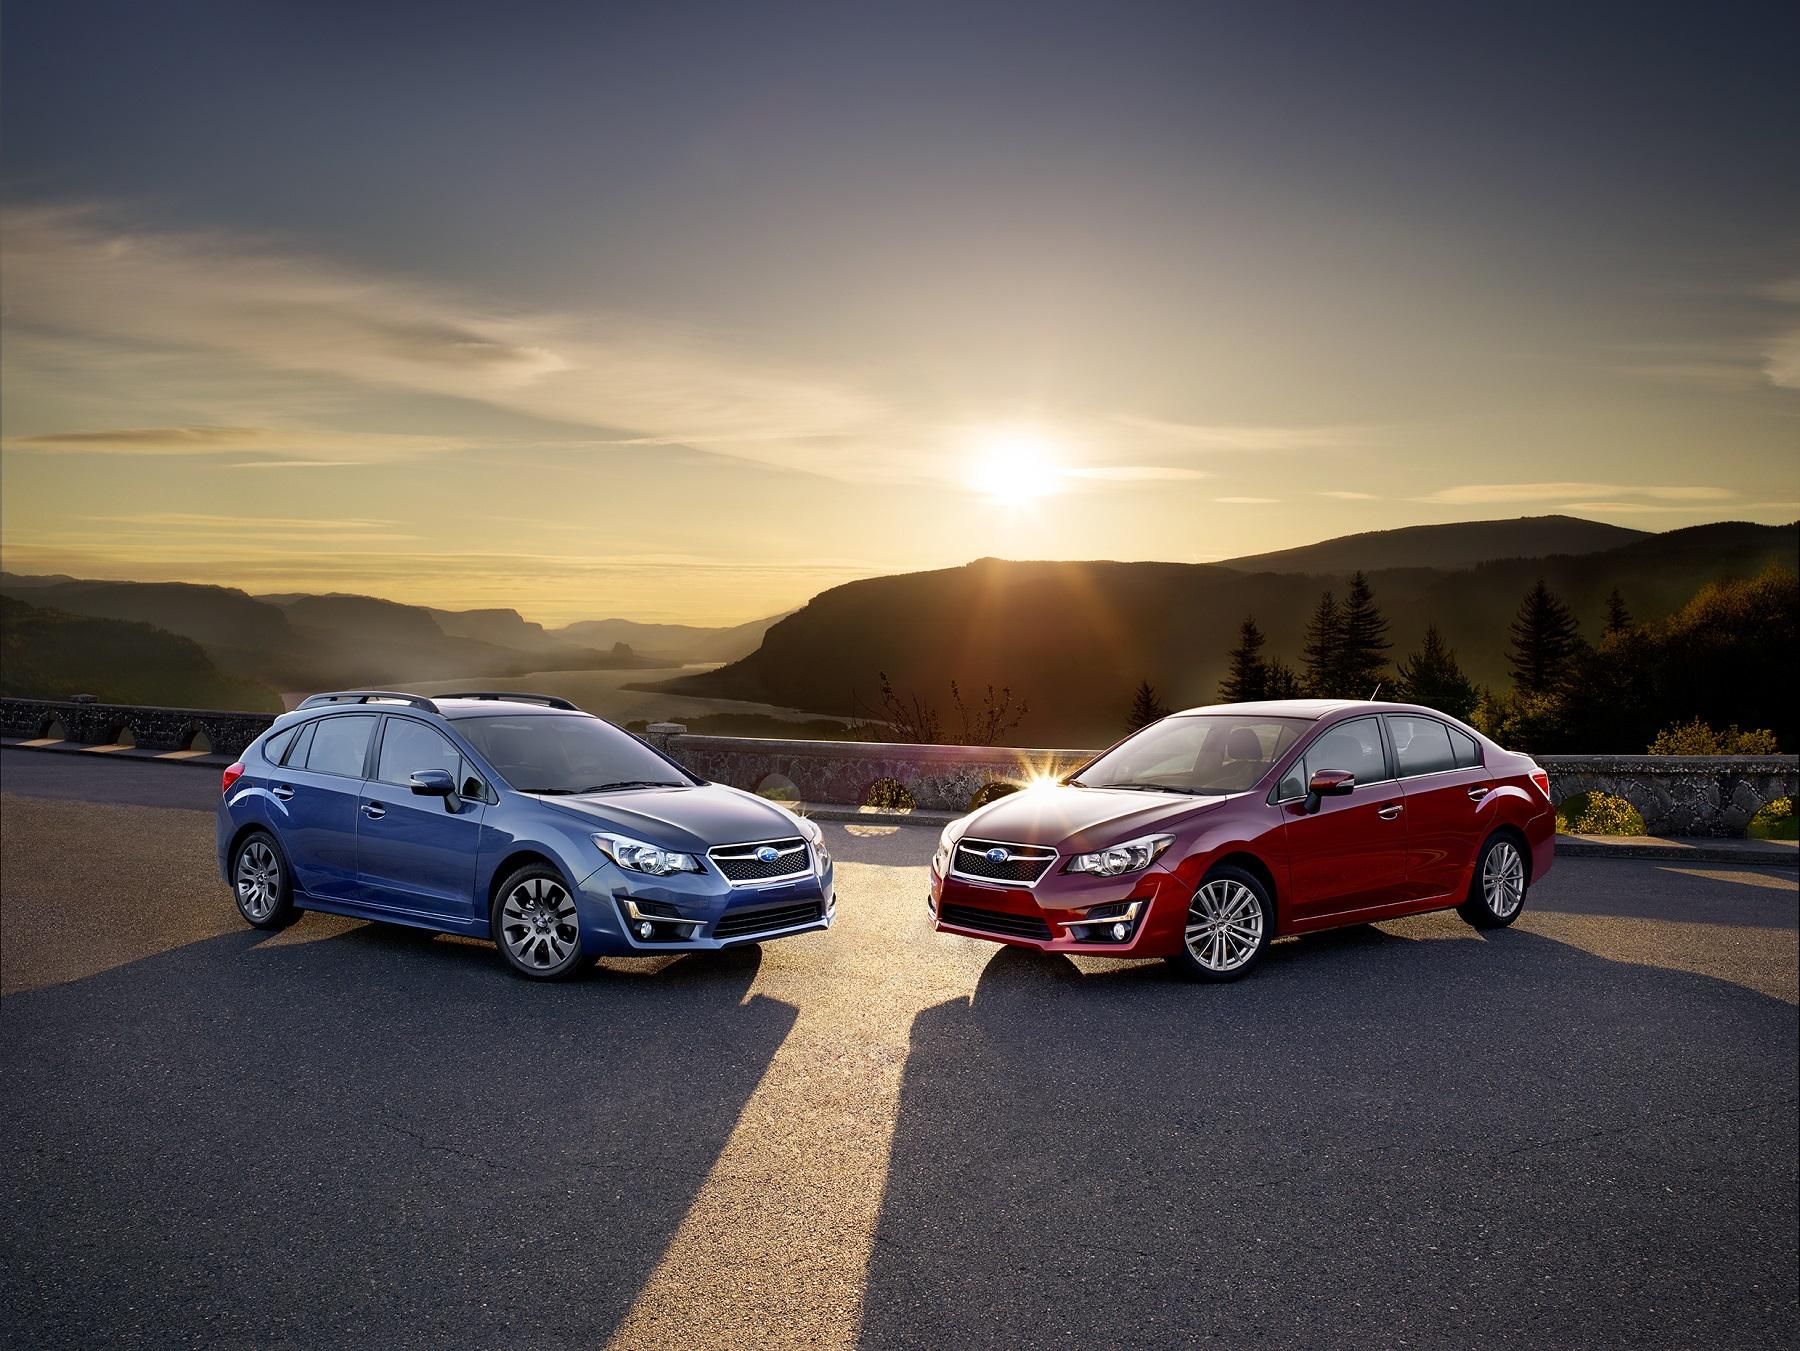 2015 Subaru Impreza: Across the line upgrades